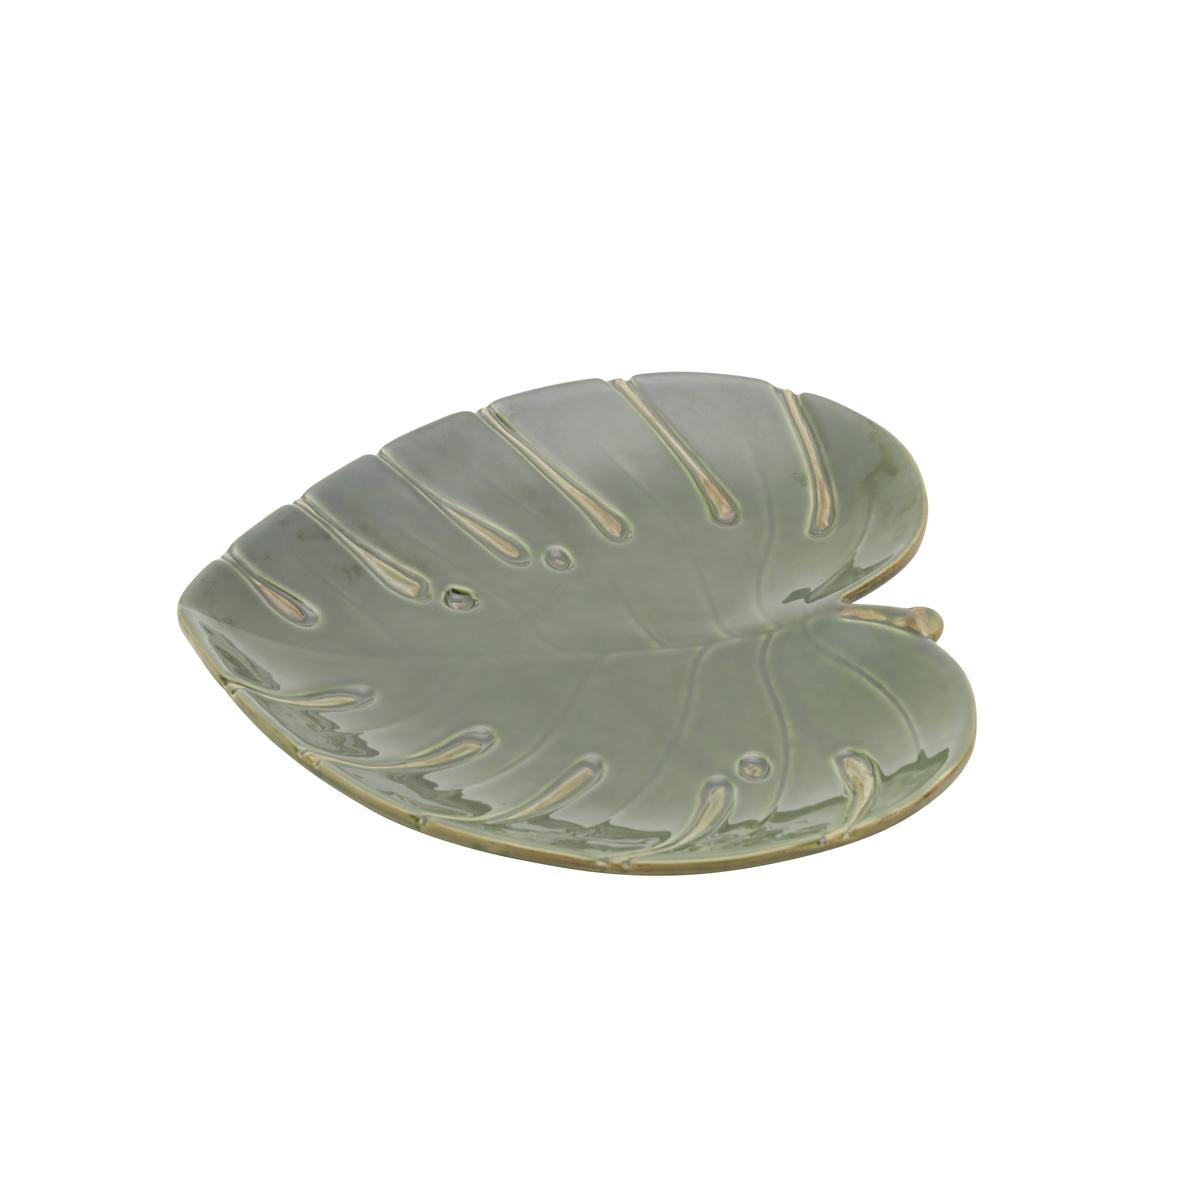 Folha decorativa costela de Adão de cerâmica